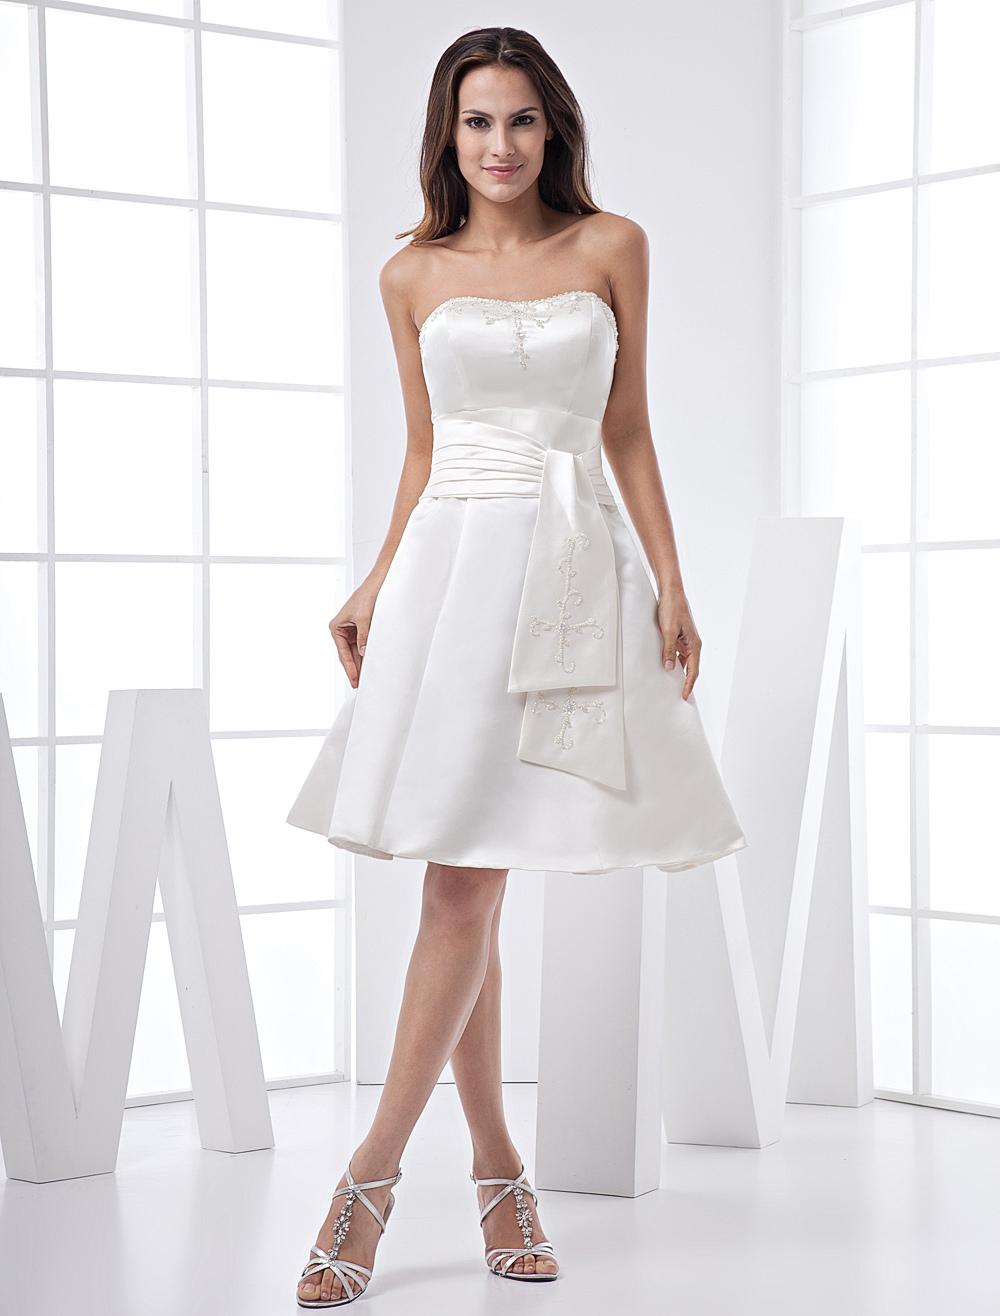 White Strapless Sash Knee Length Satin Prom Homecoming Dress